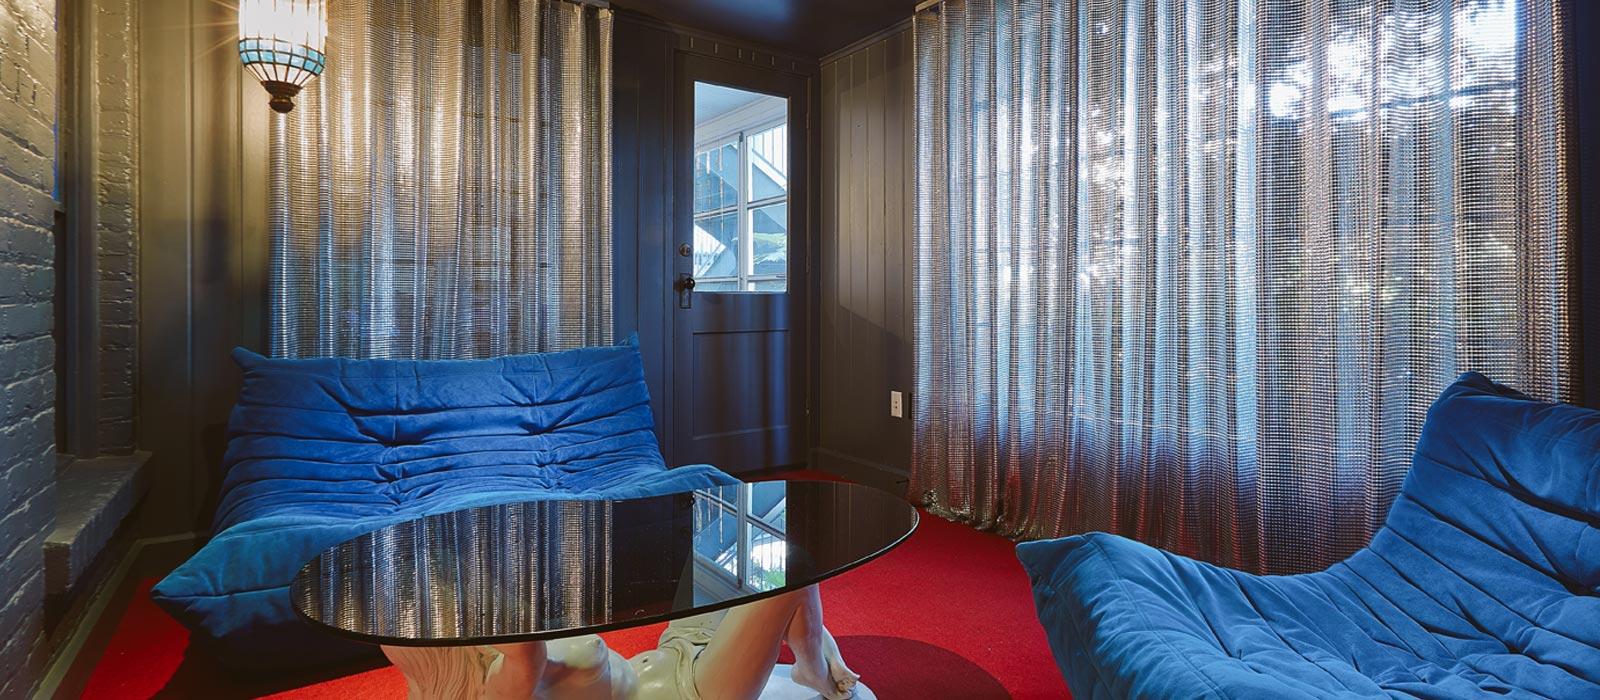 6 suite 5 Hotel Saint Cecilia Austin Texas interior design vintage apartment ciekawe wnetrza hotelowe styl amerykanski